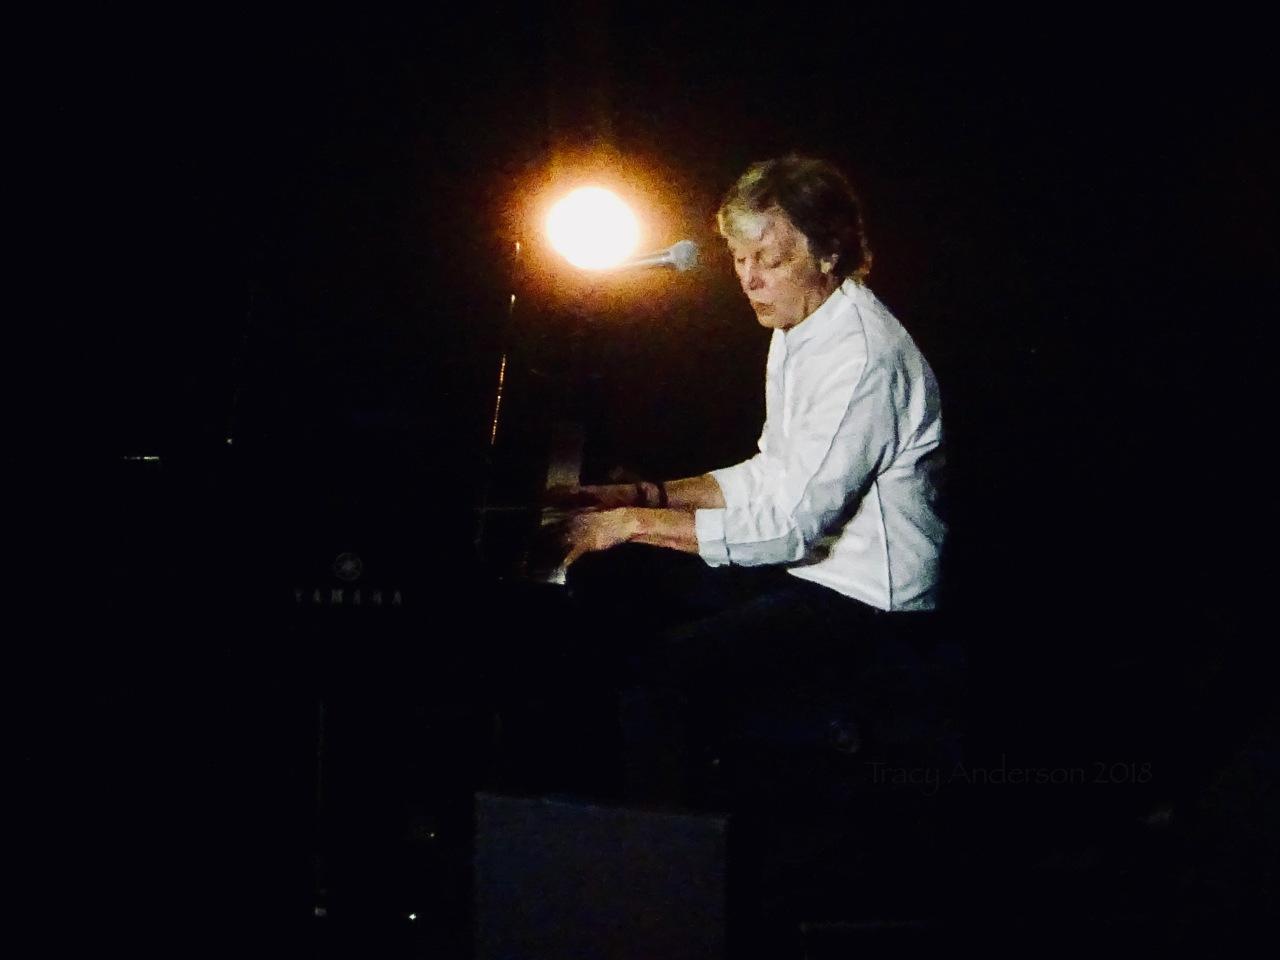 Paul McCartney Piano Freshen Up Tour Rogers Place Sept 30 2018